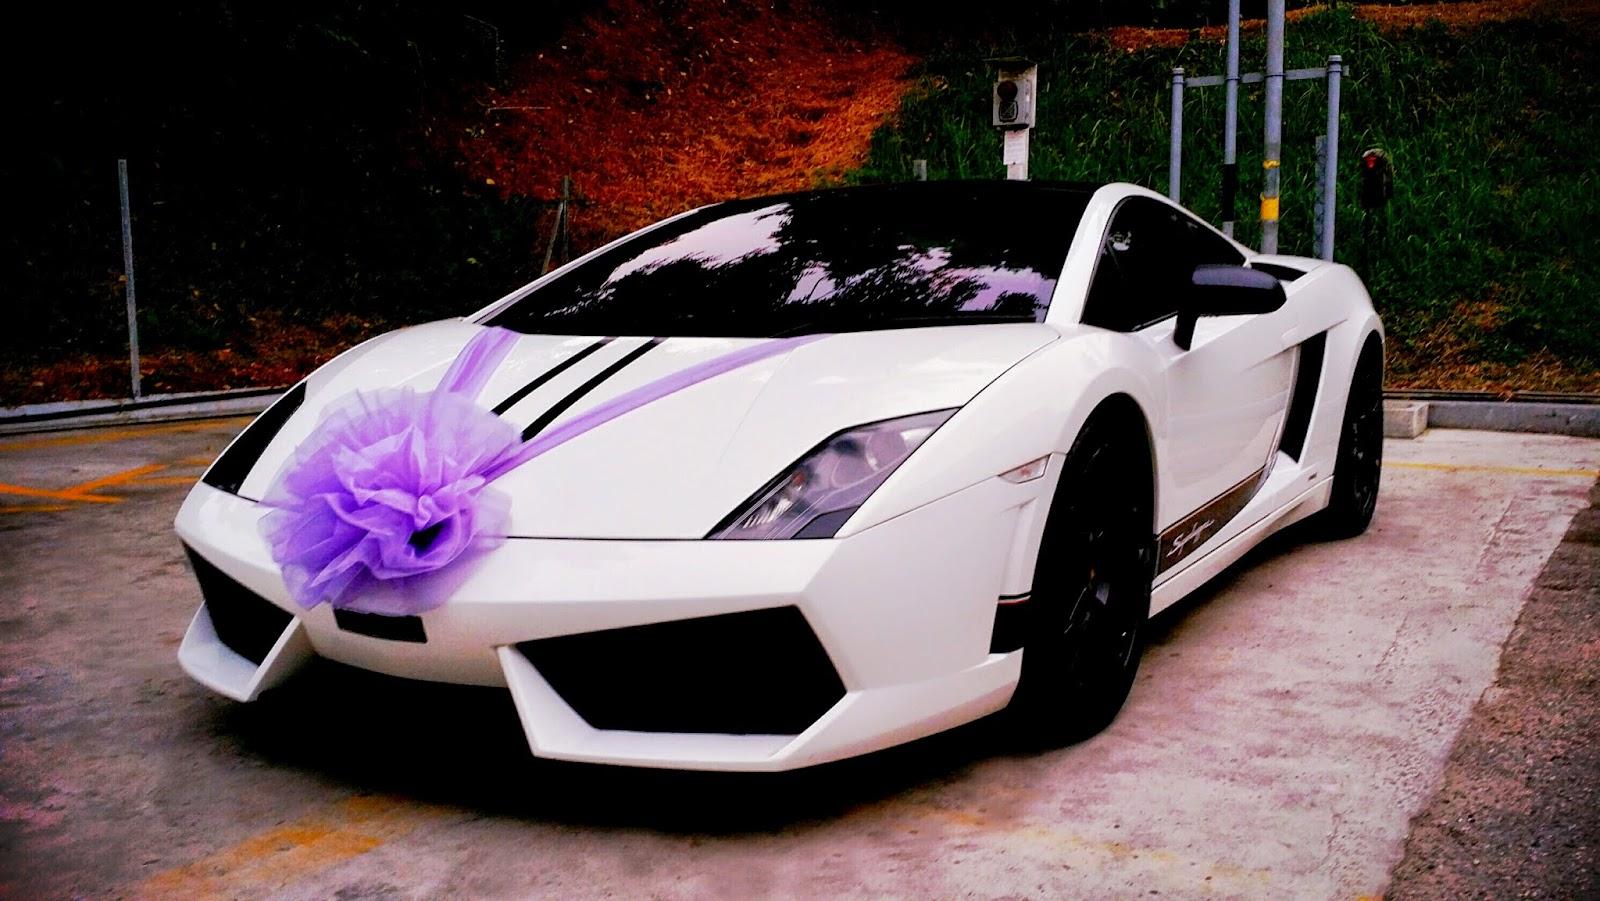 redorca malaysia wedding and event car rental bridal car decoration. Black Bedroom Furniture Sets. Home Design Ideas